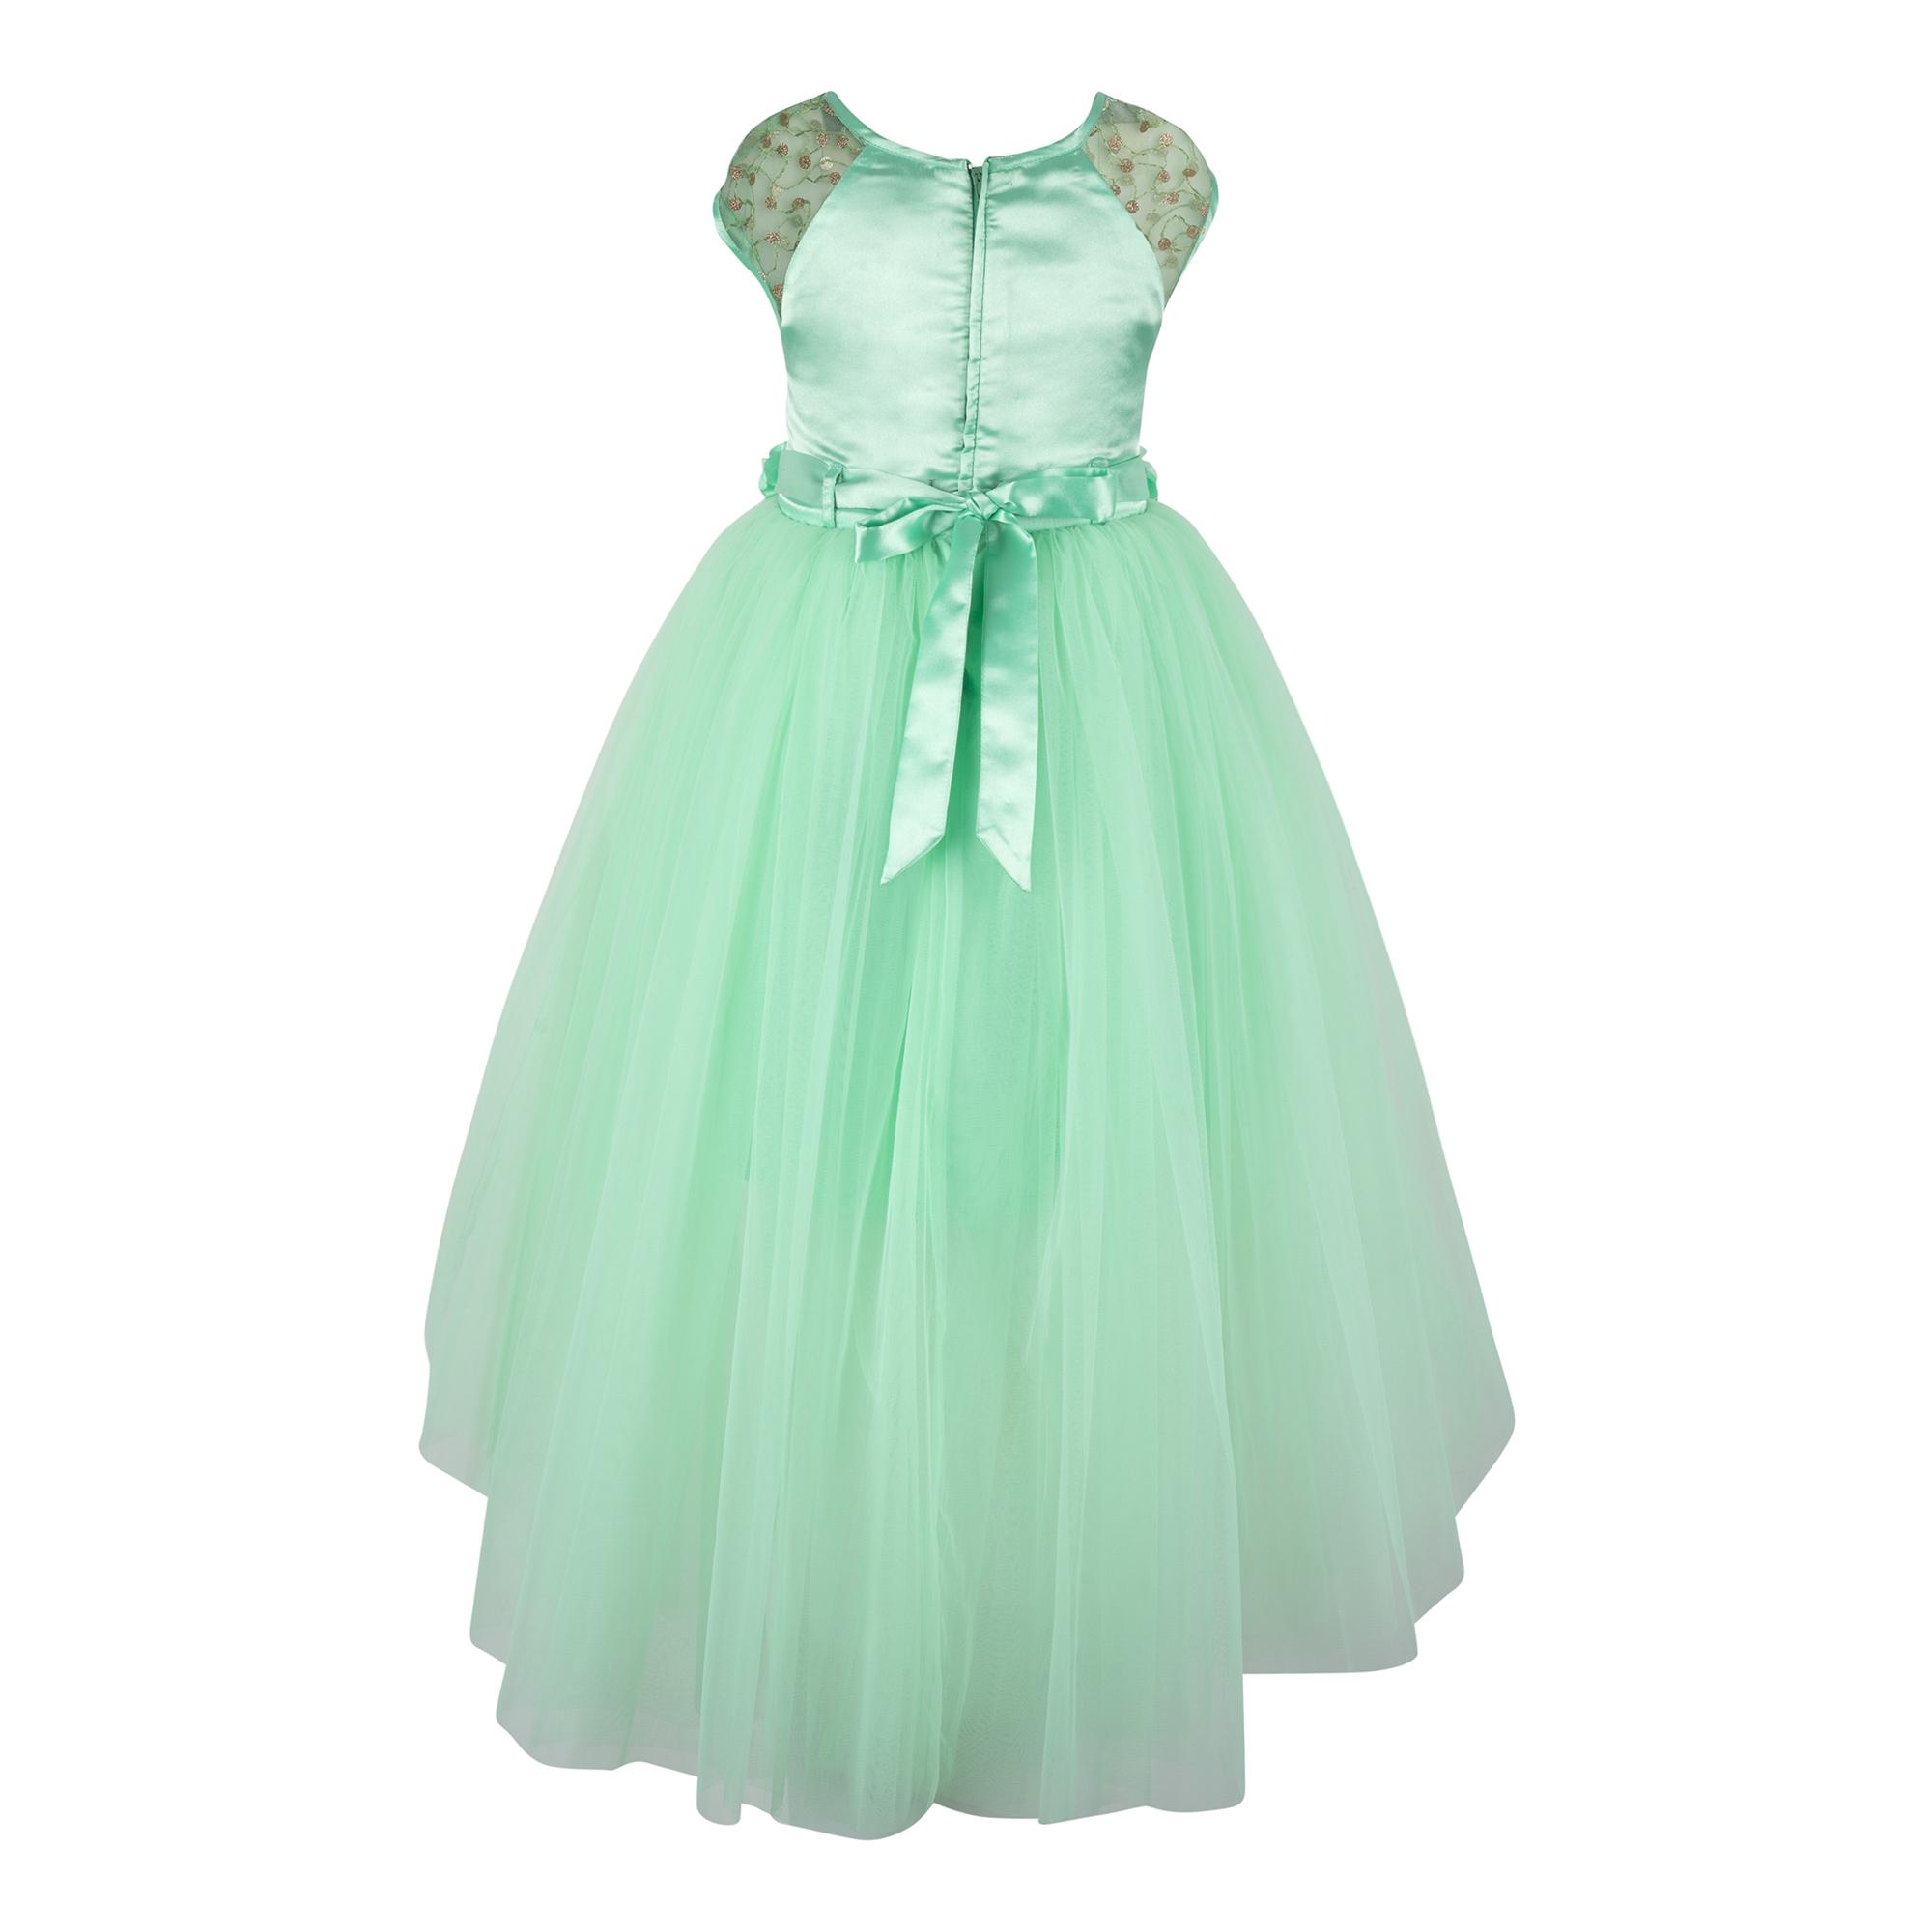 Embellished Sea Green Hi-low Dress